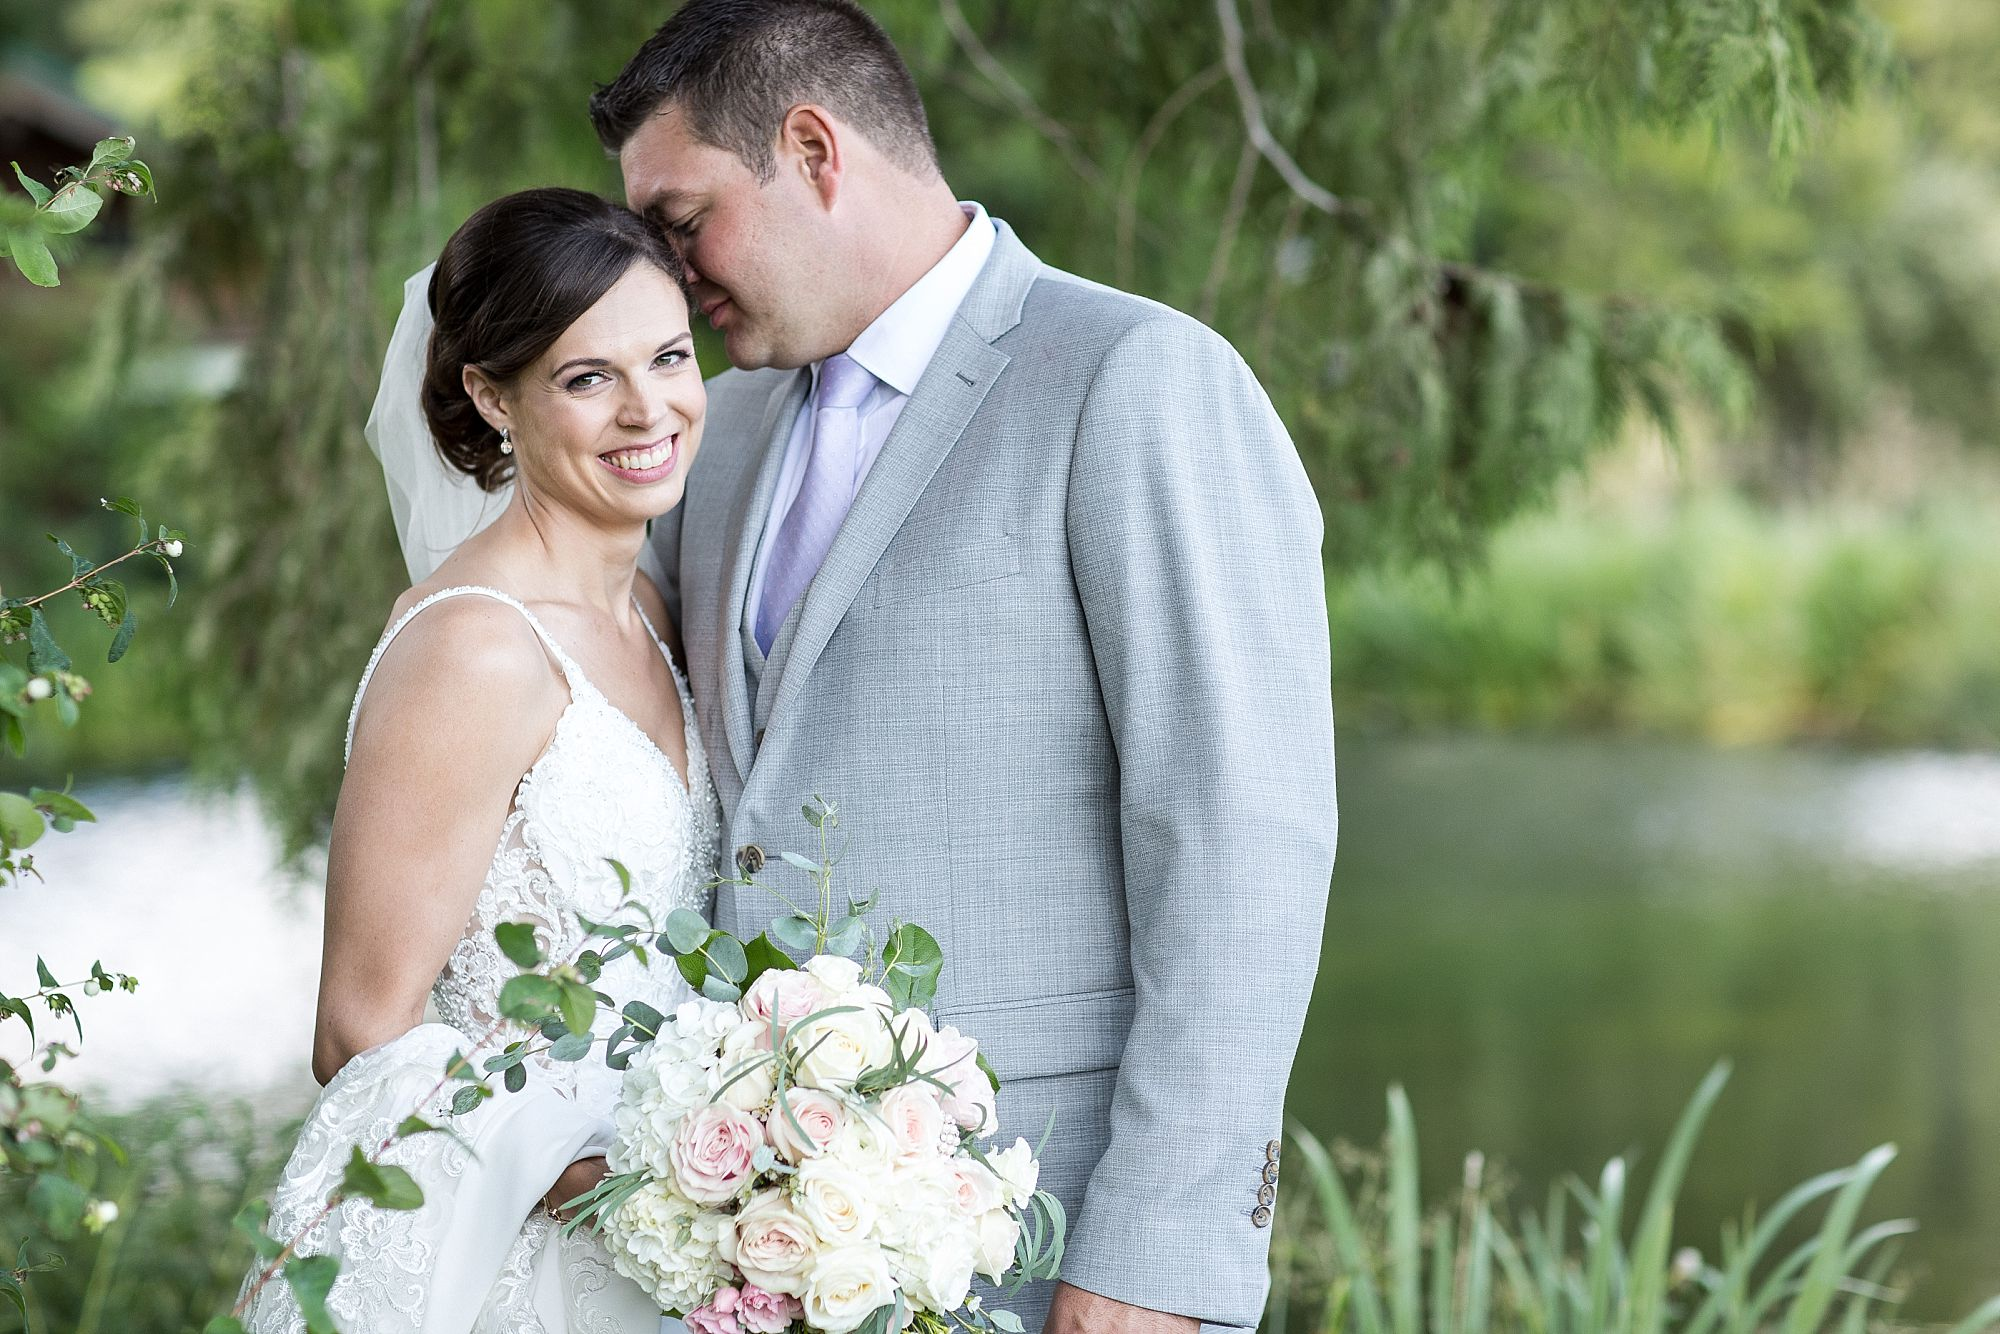 Vancouver Wedding Photography Hayley Rae Photography Associate_0011.jpg